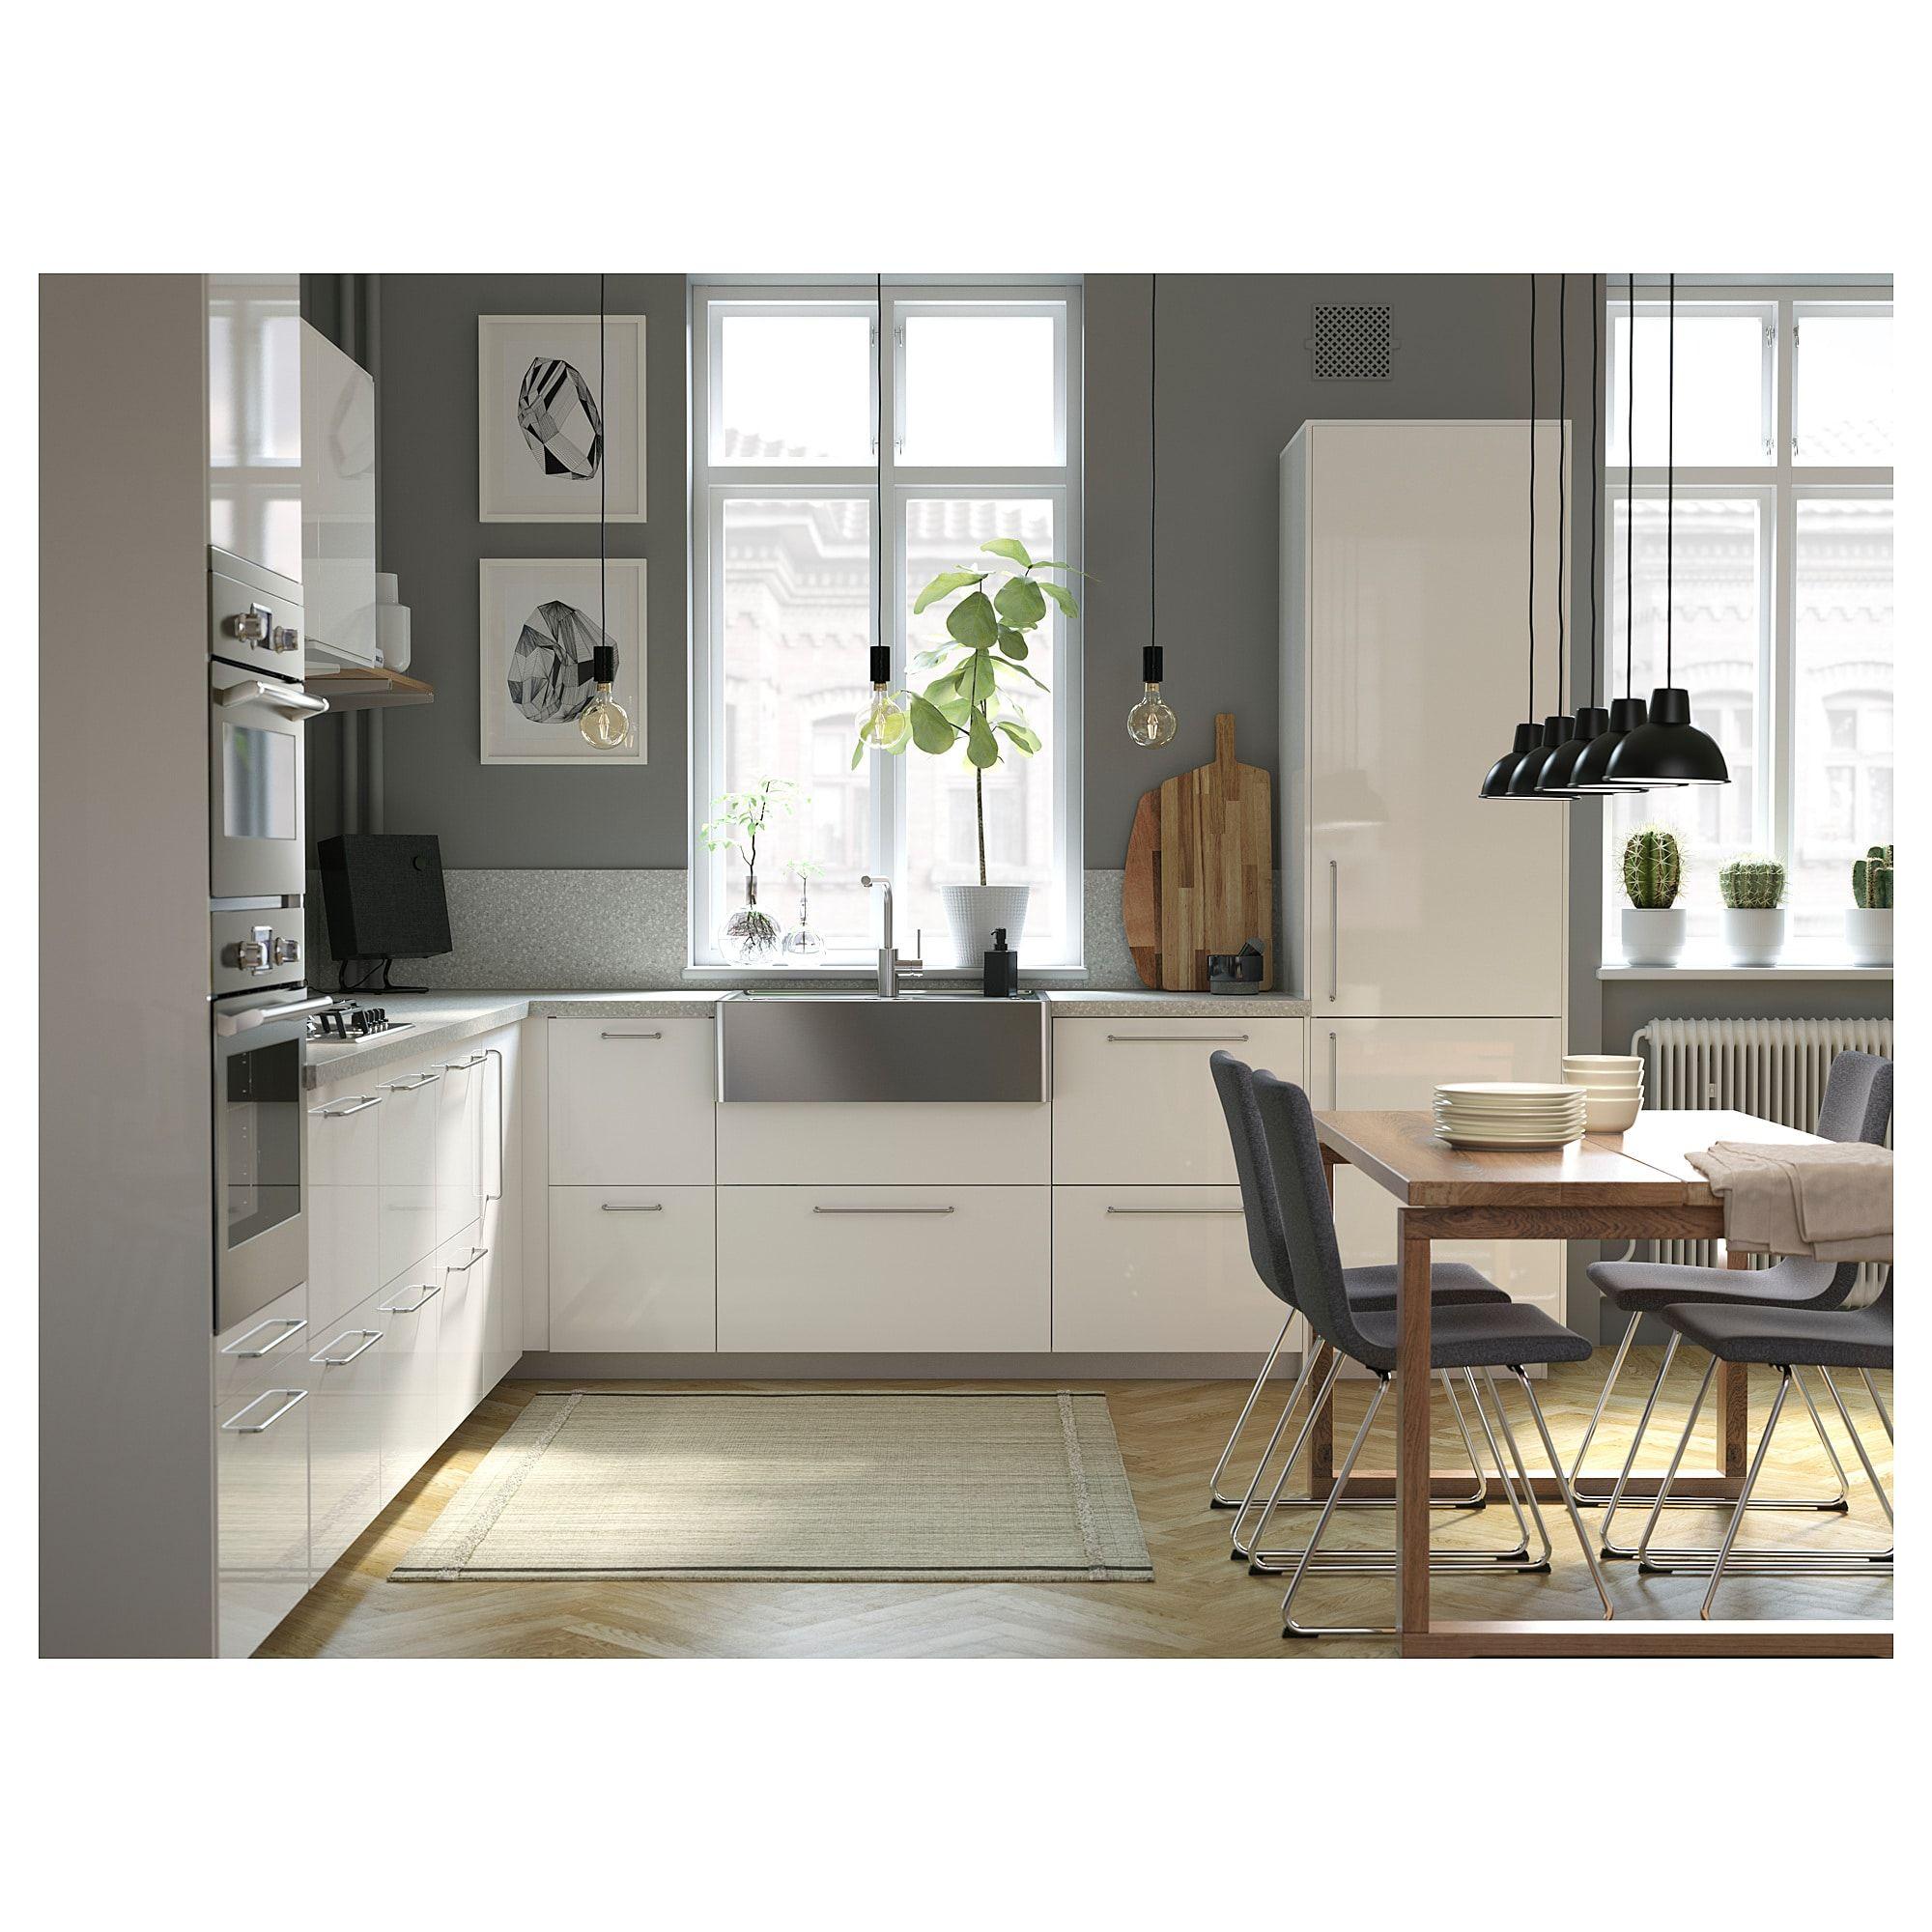 SÄLJAN Countertop light gray mineral effect, laminate